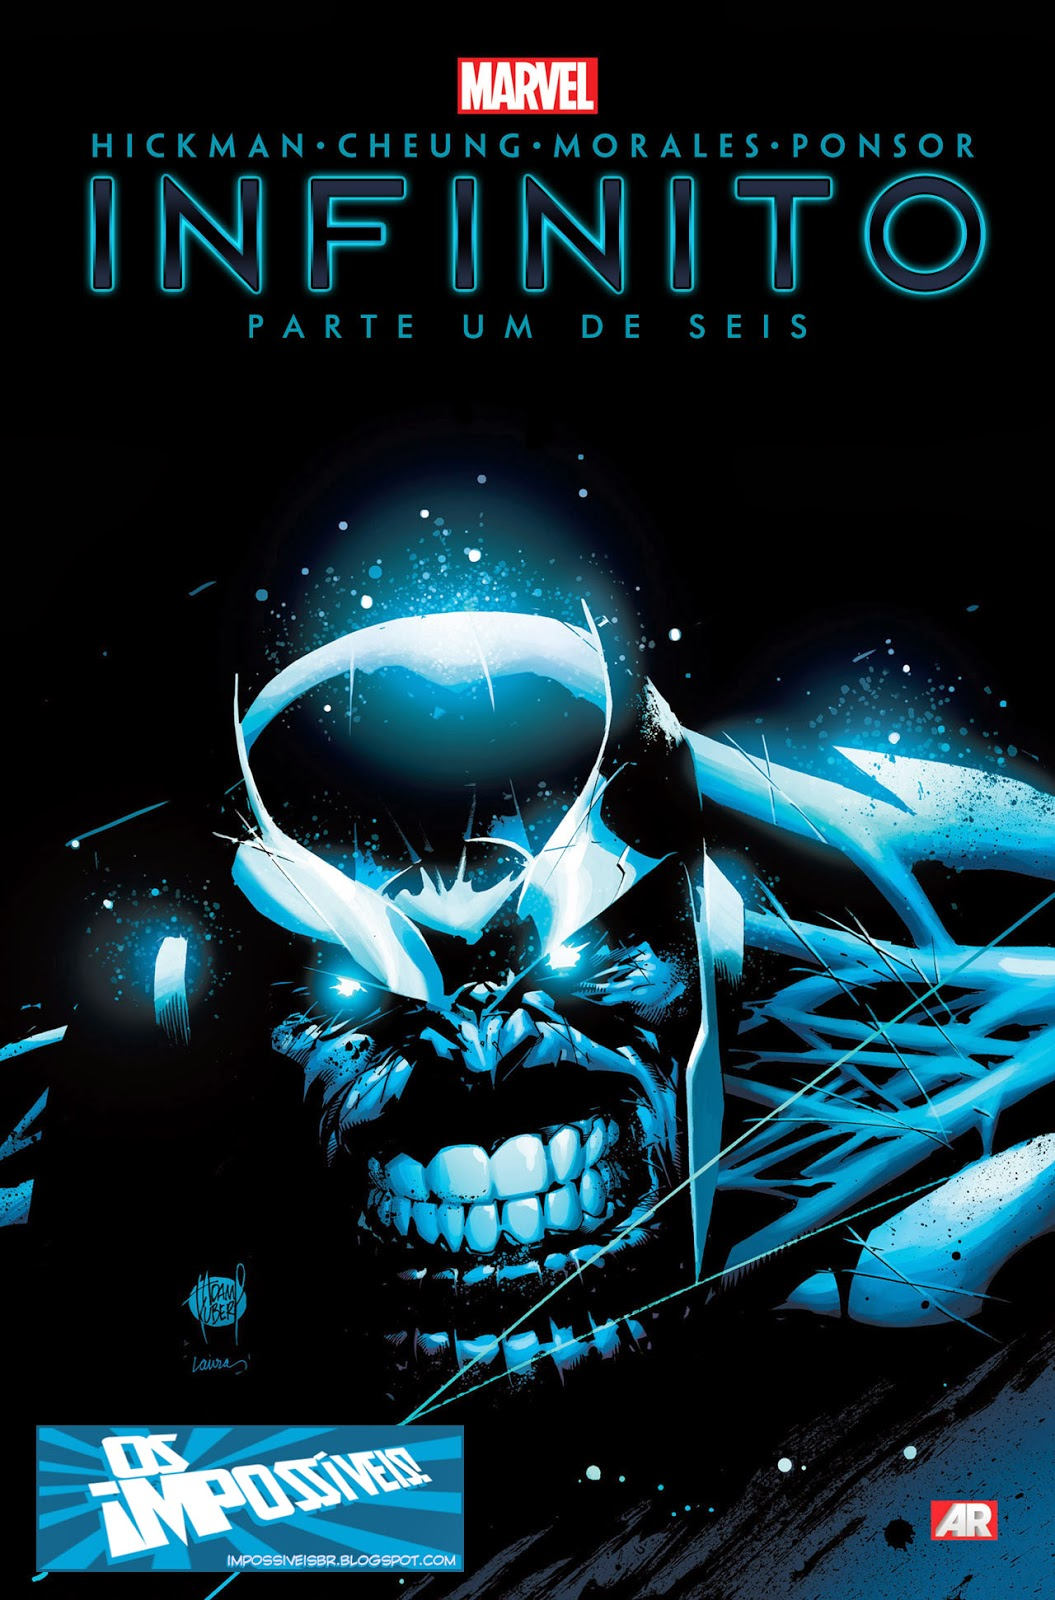 Nova Marvel! Infinito #1